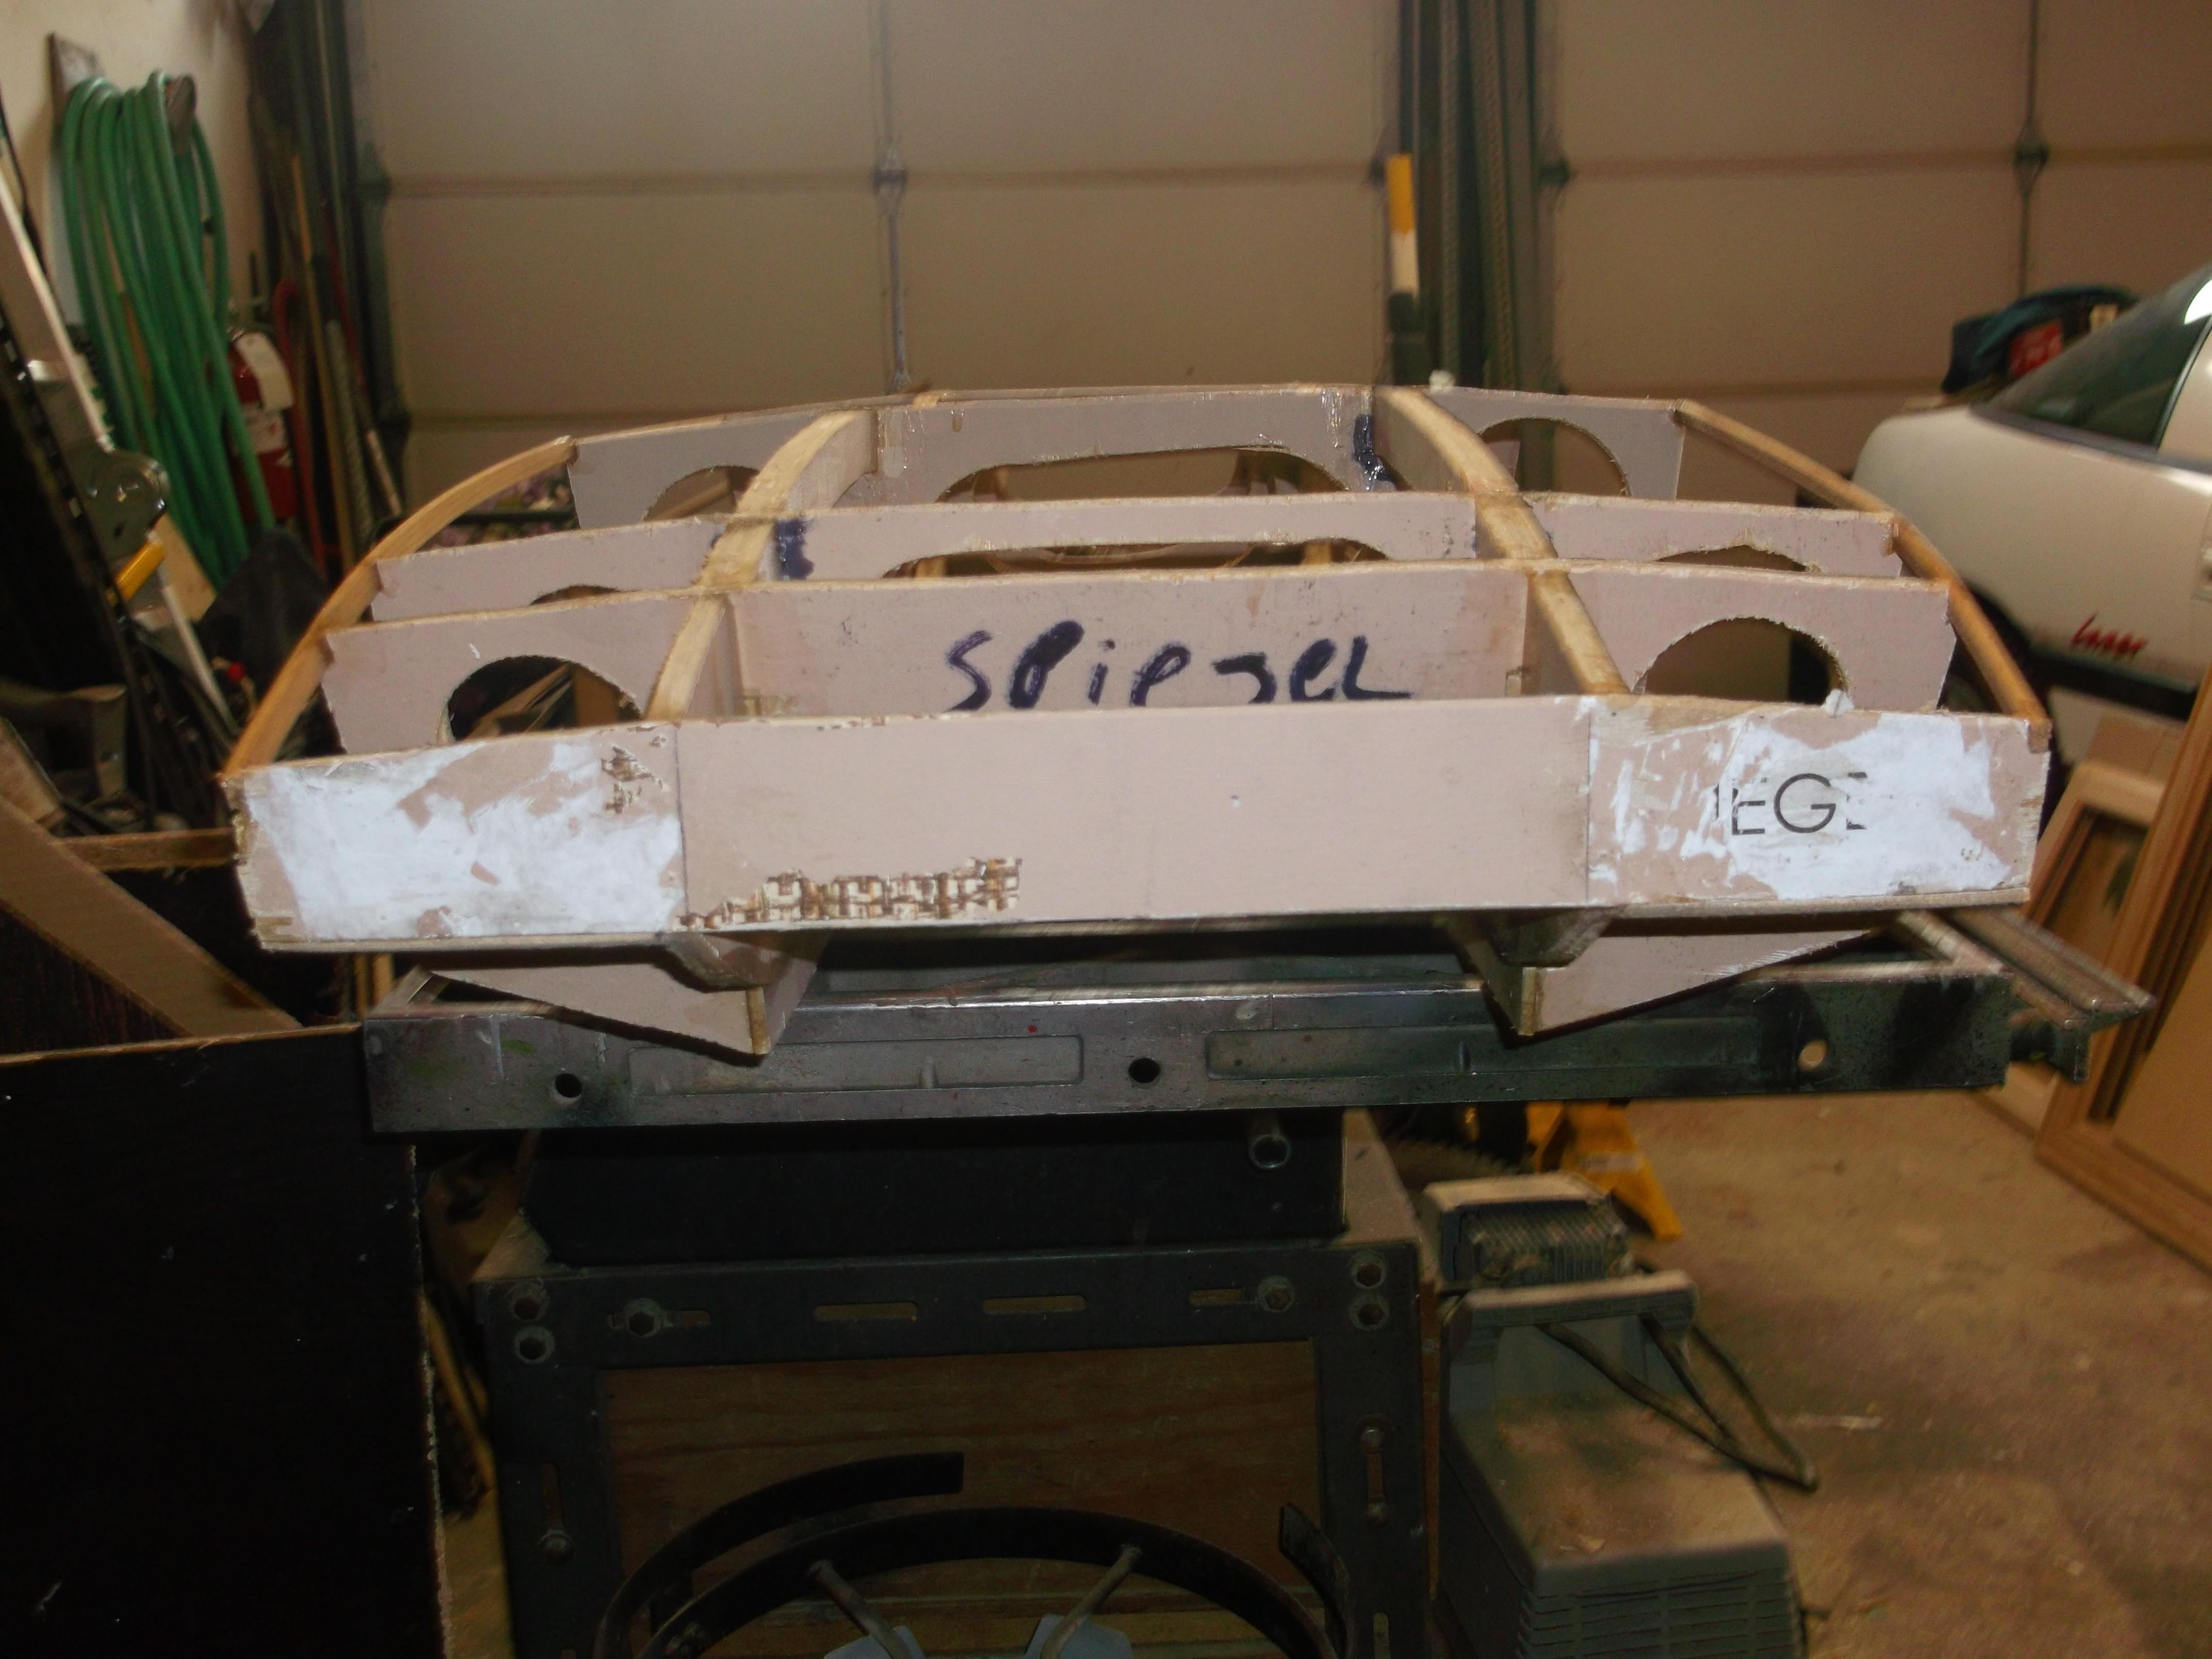 weed eater max cat build (rc catamaran boat) - RCU Forums